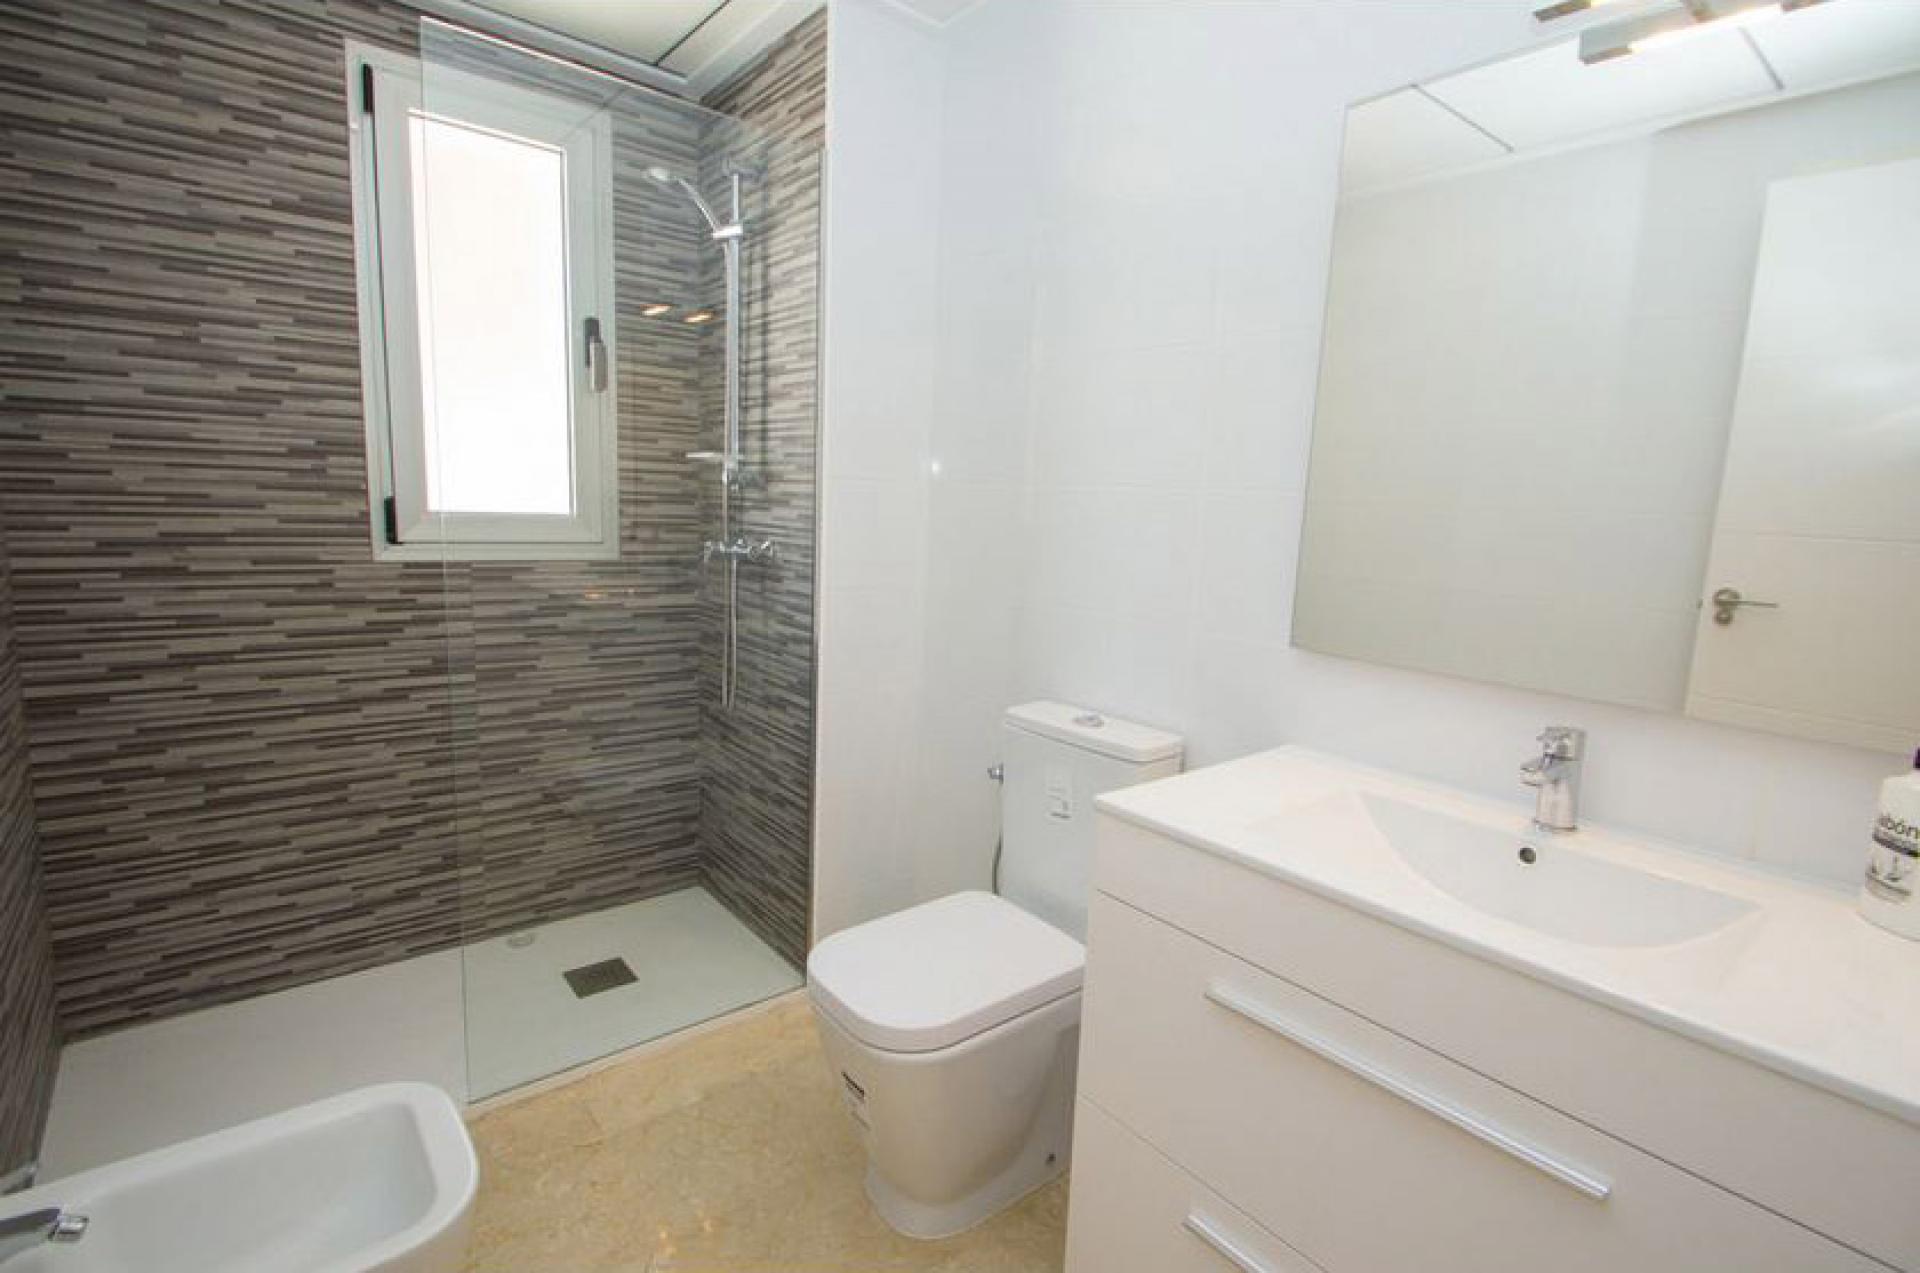 Apartments for sale Villamartin, orihuela-Costa in Medvilla Spanje